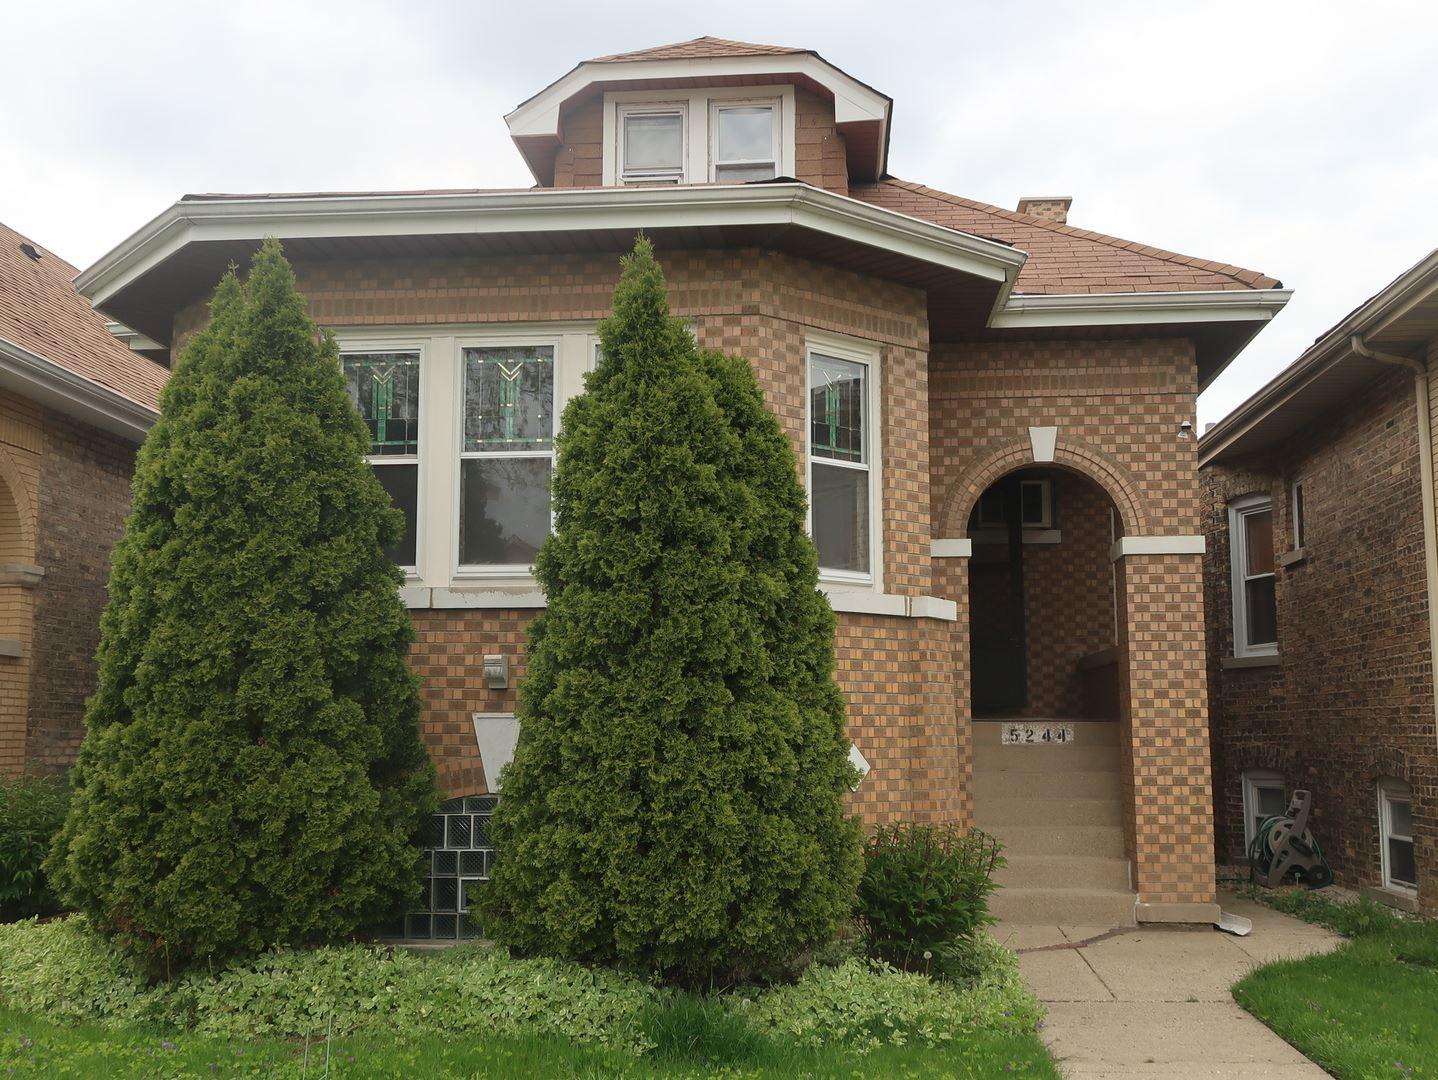 5244 W George Street, Chicago, IL 60641 - #: 10704423